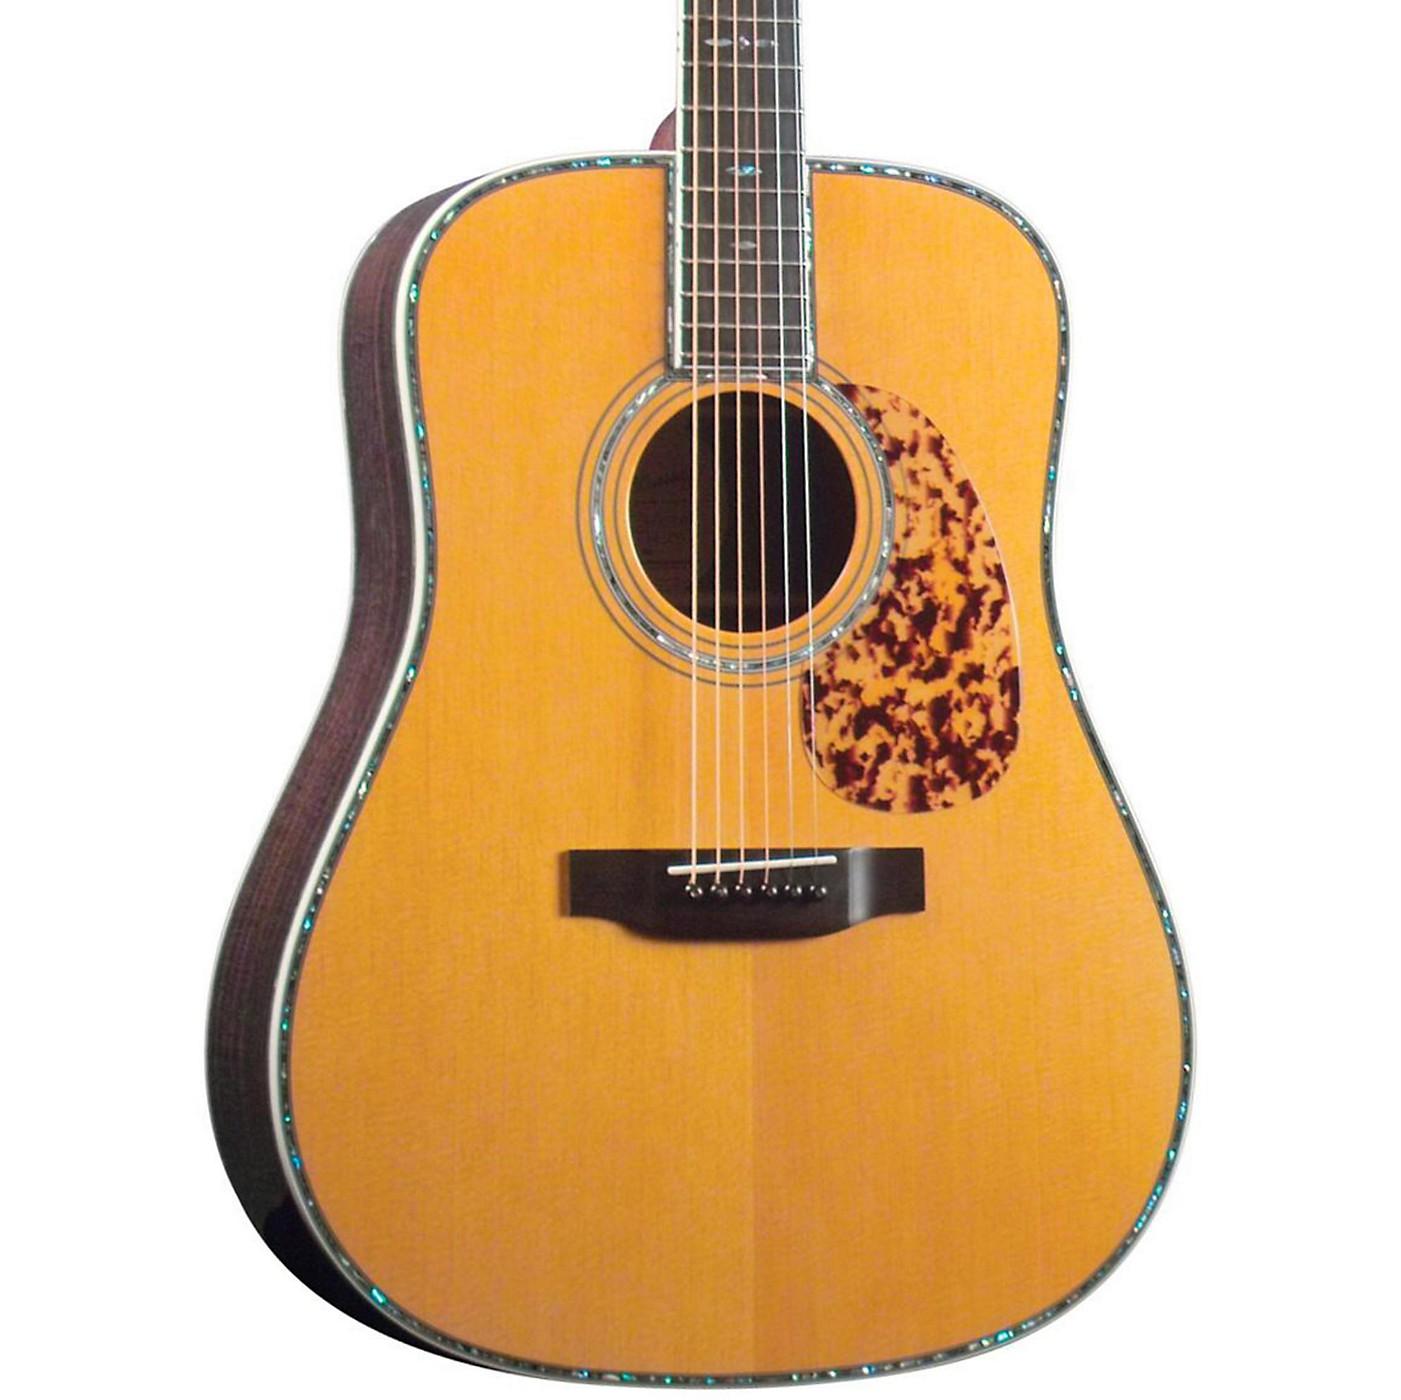 Blueridge Historic Series BR-180 Dreadnought Acoustic Guitar thumbnail